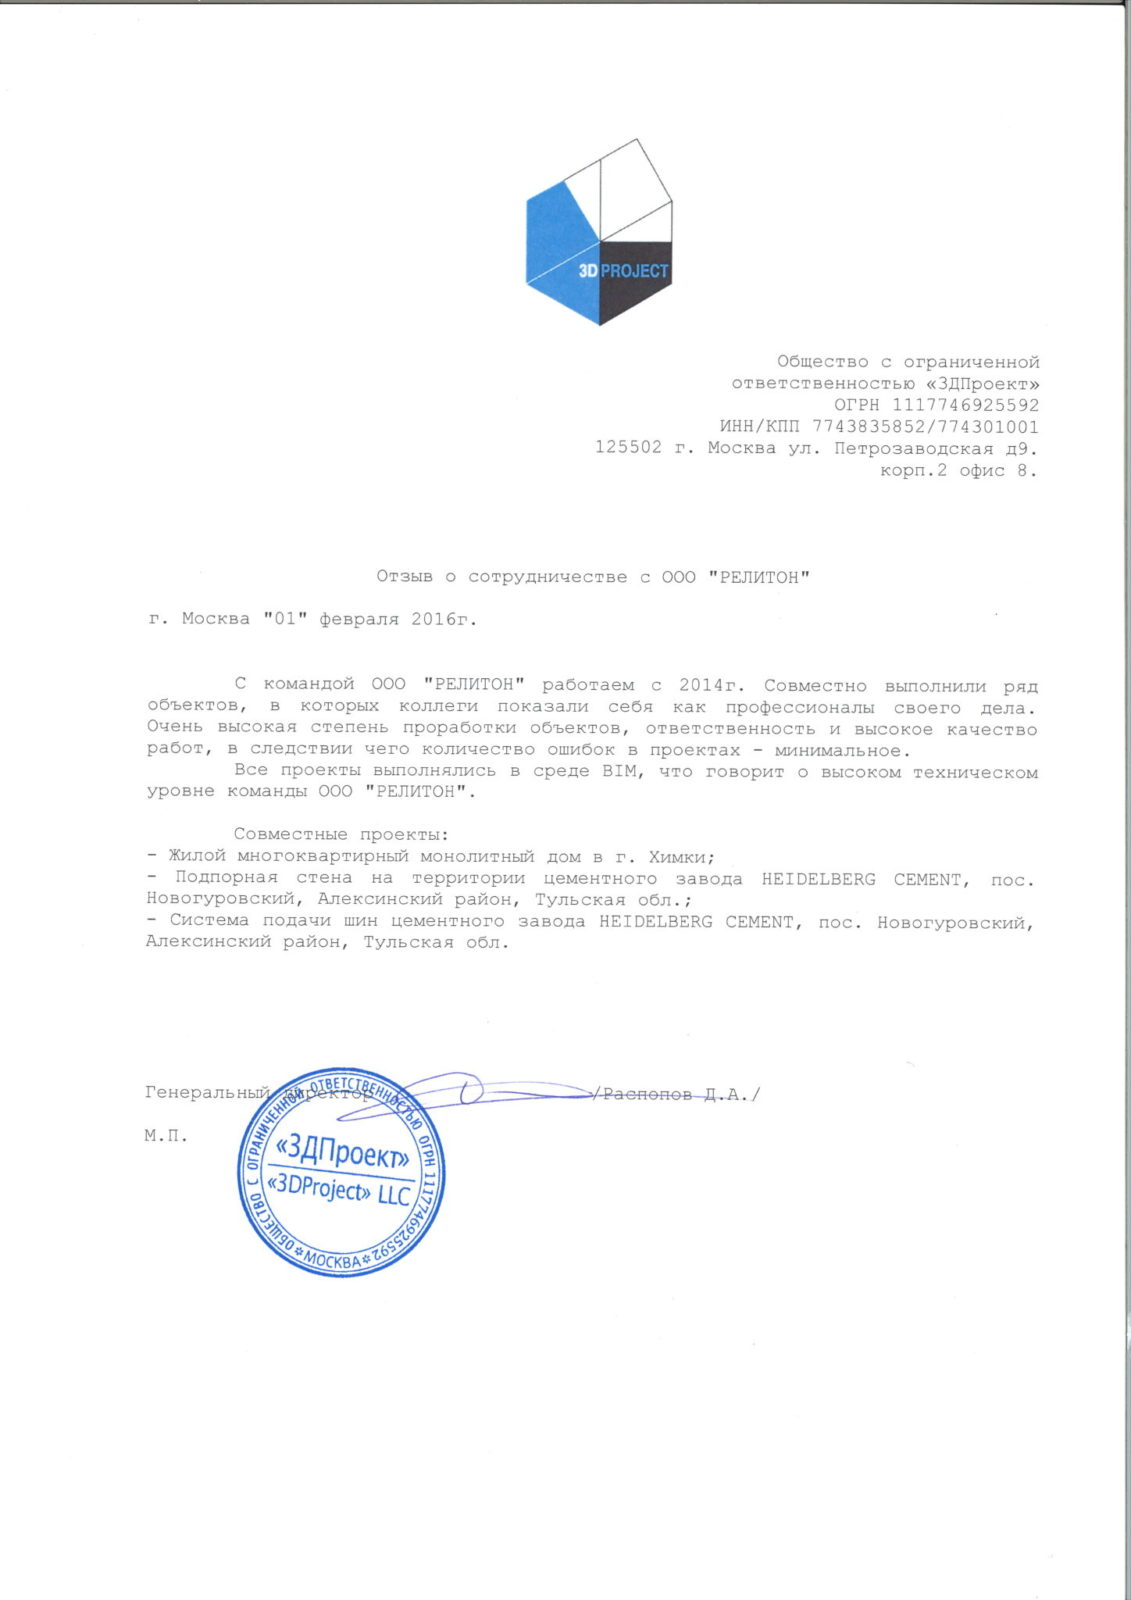 Otzyv-o-sotrudnichestve-s-kompaniej-reliton-ot-kompanii-OOO-3DProekt.jpg